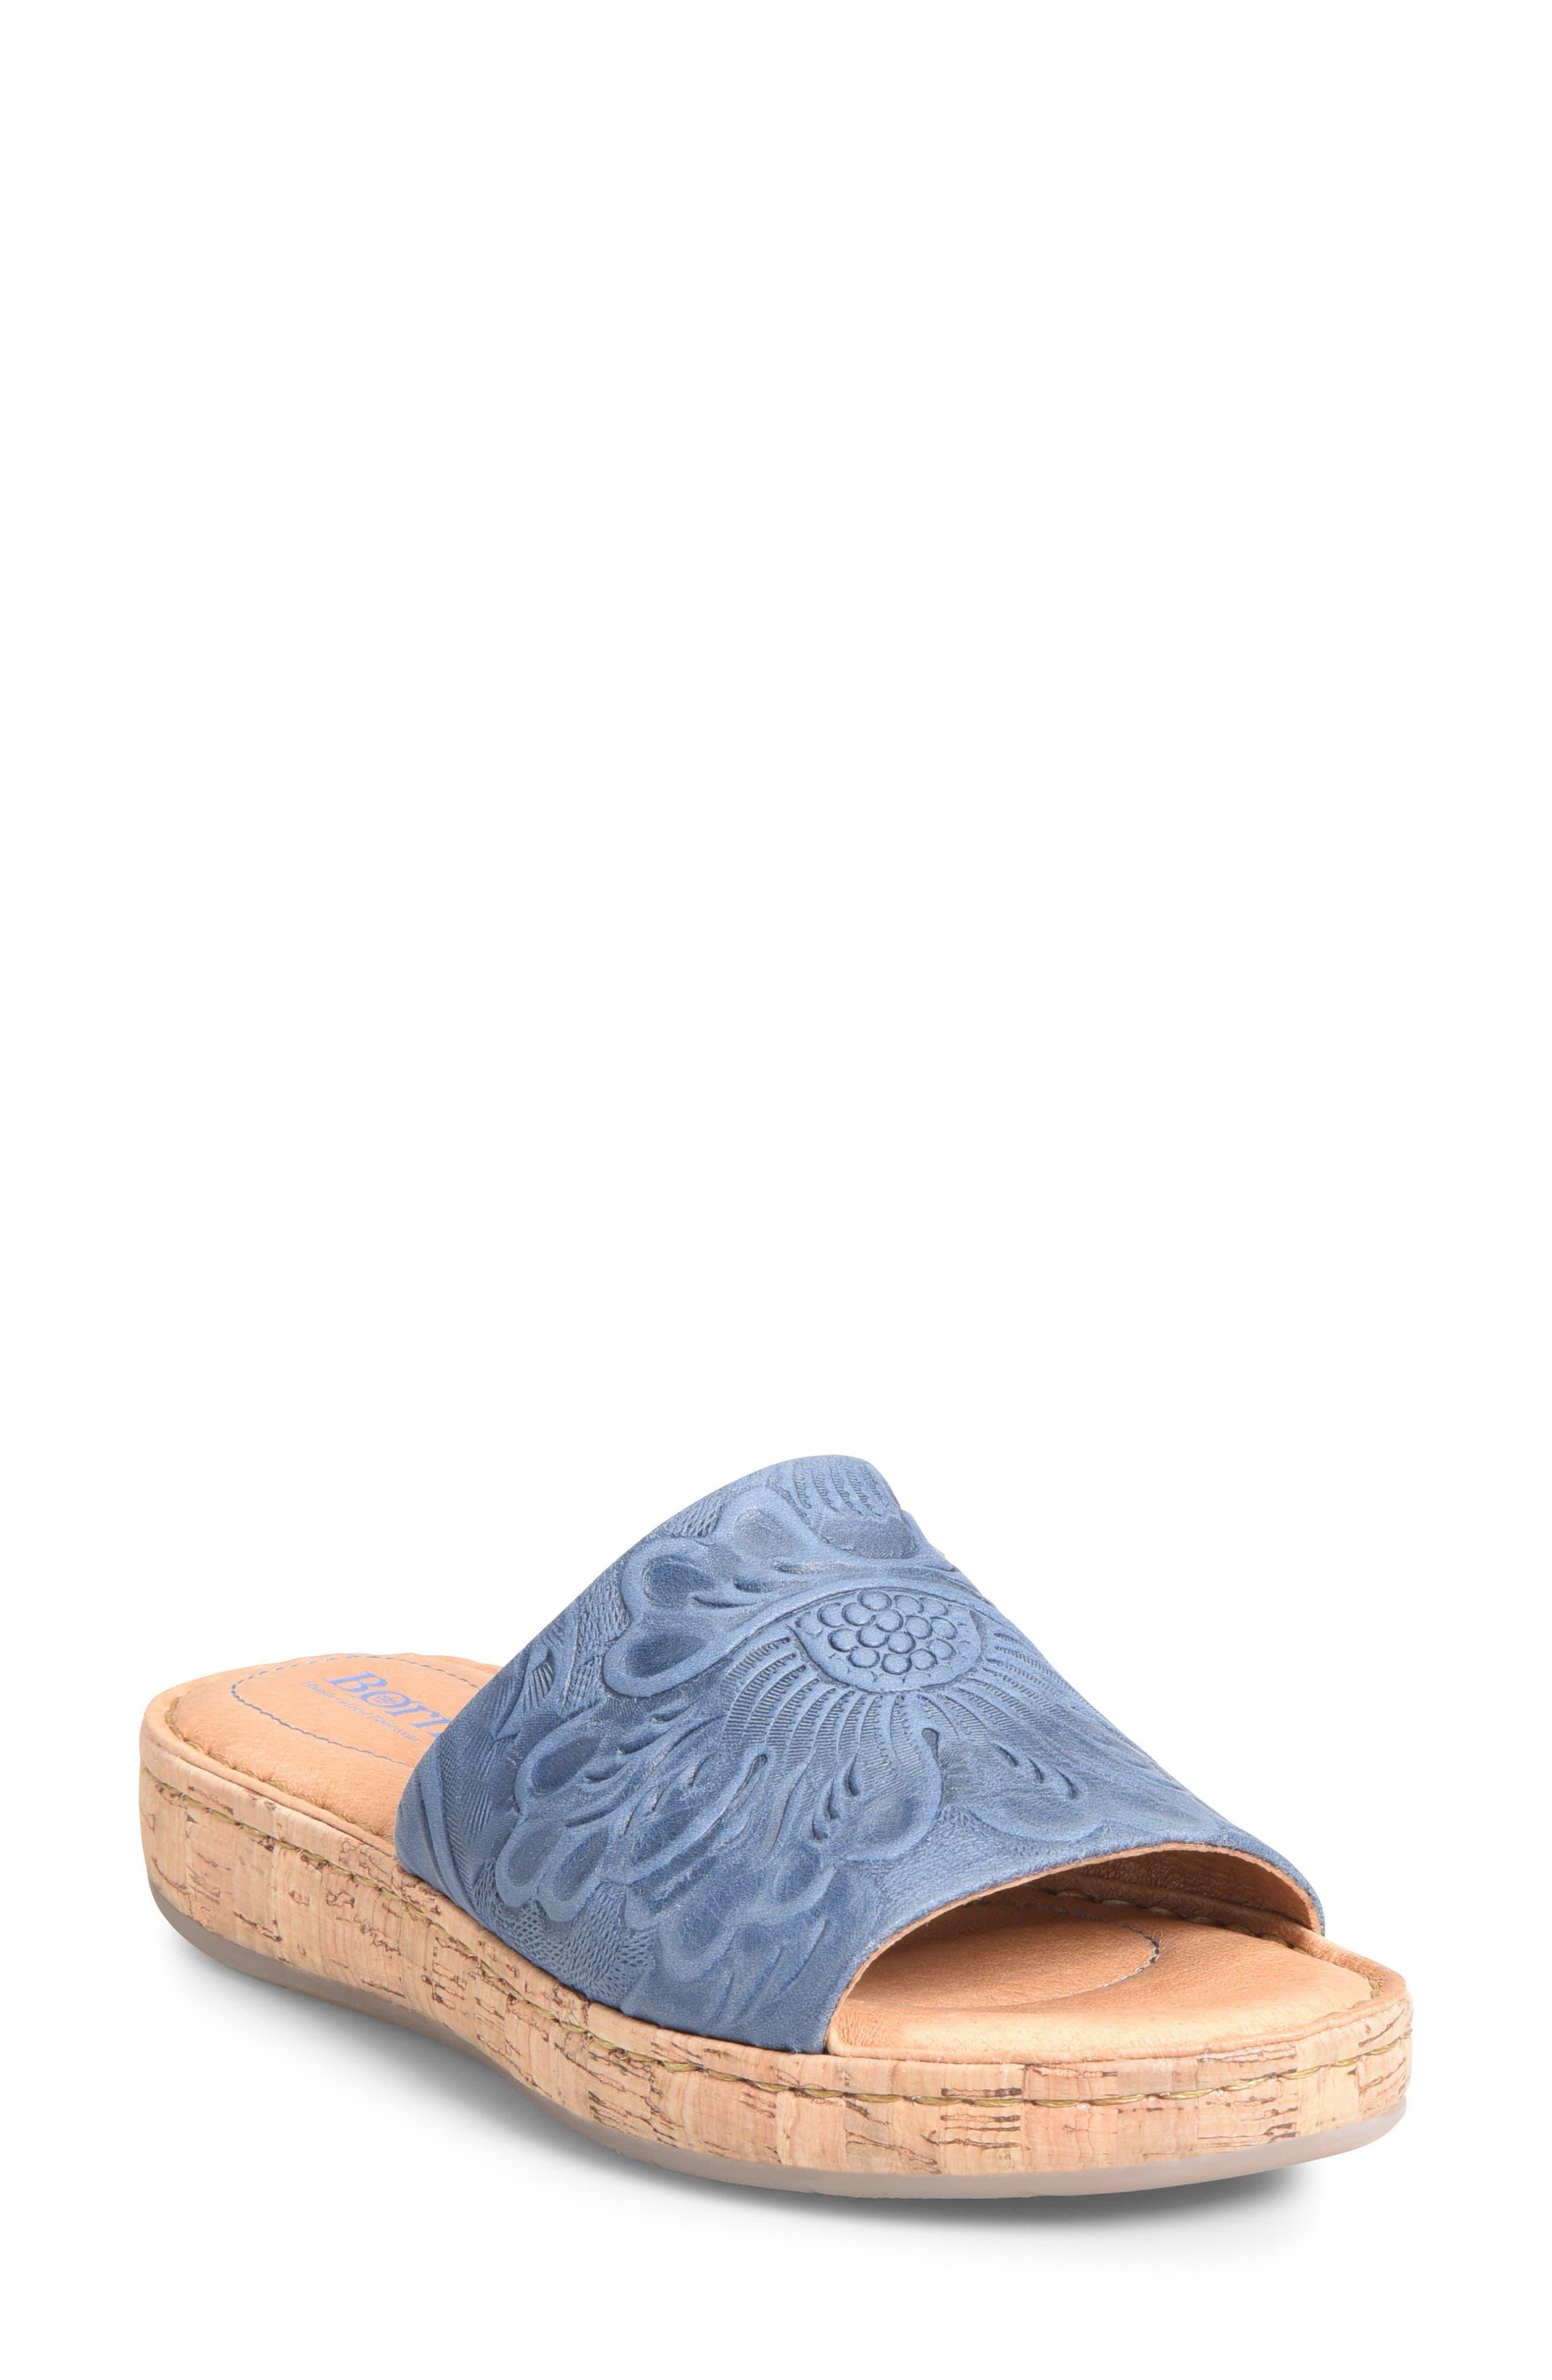 B?rn Fish Lake Tooled Slide Sandal, Blue